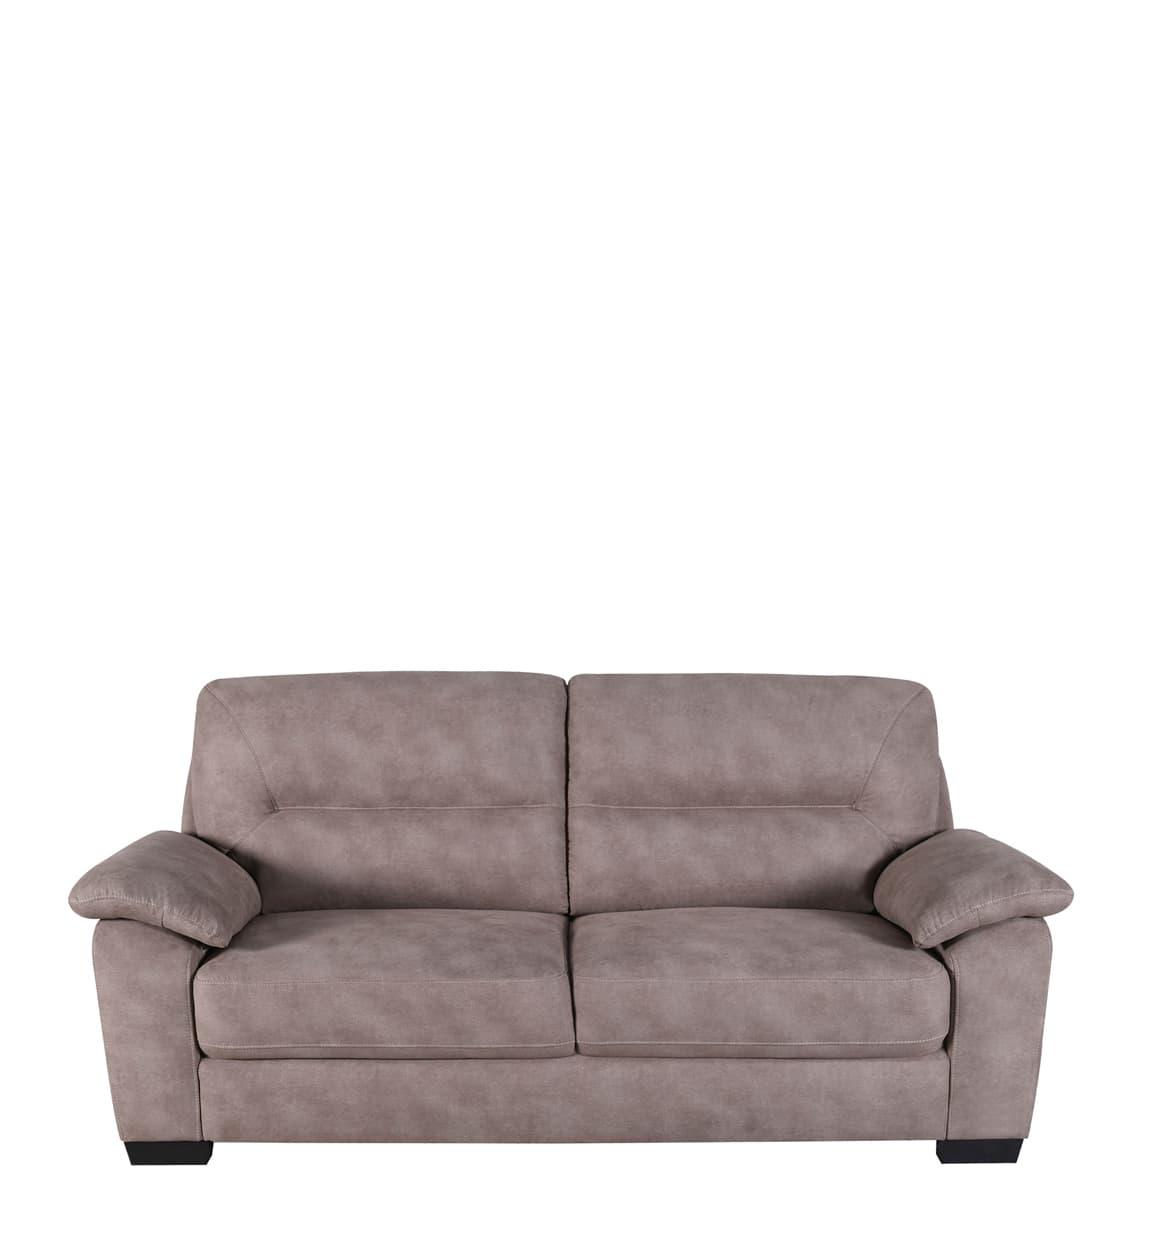 Canapea fixa tapitata cu stofa, 3 locuri, Albert Maro, l200xA92xH92 cm somproduct.ro